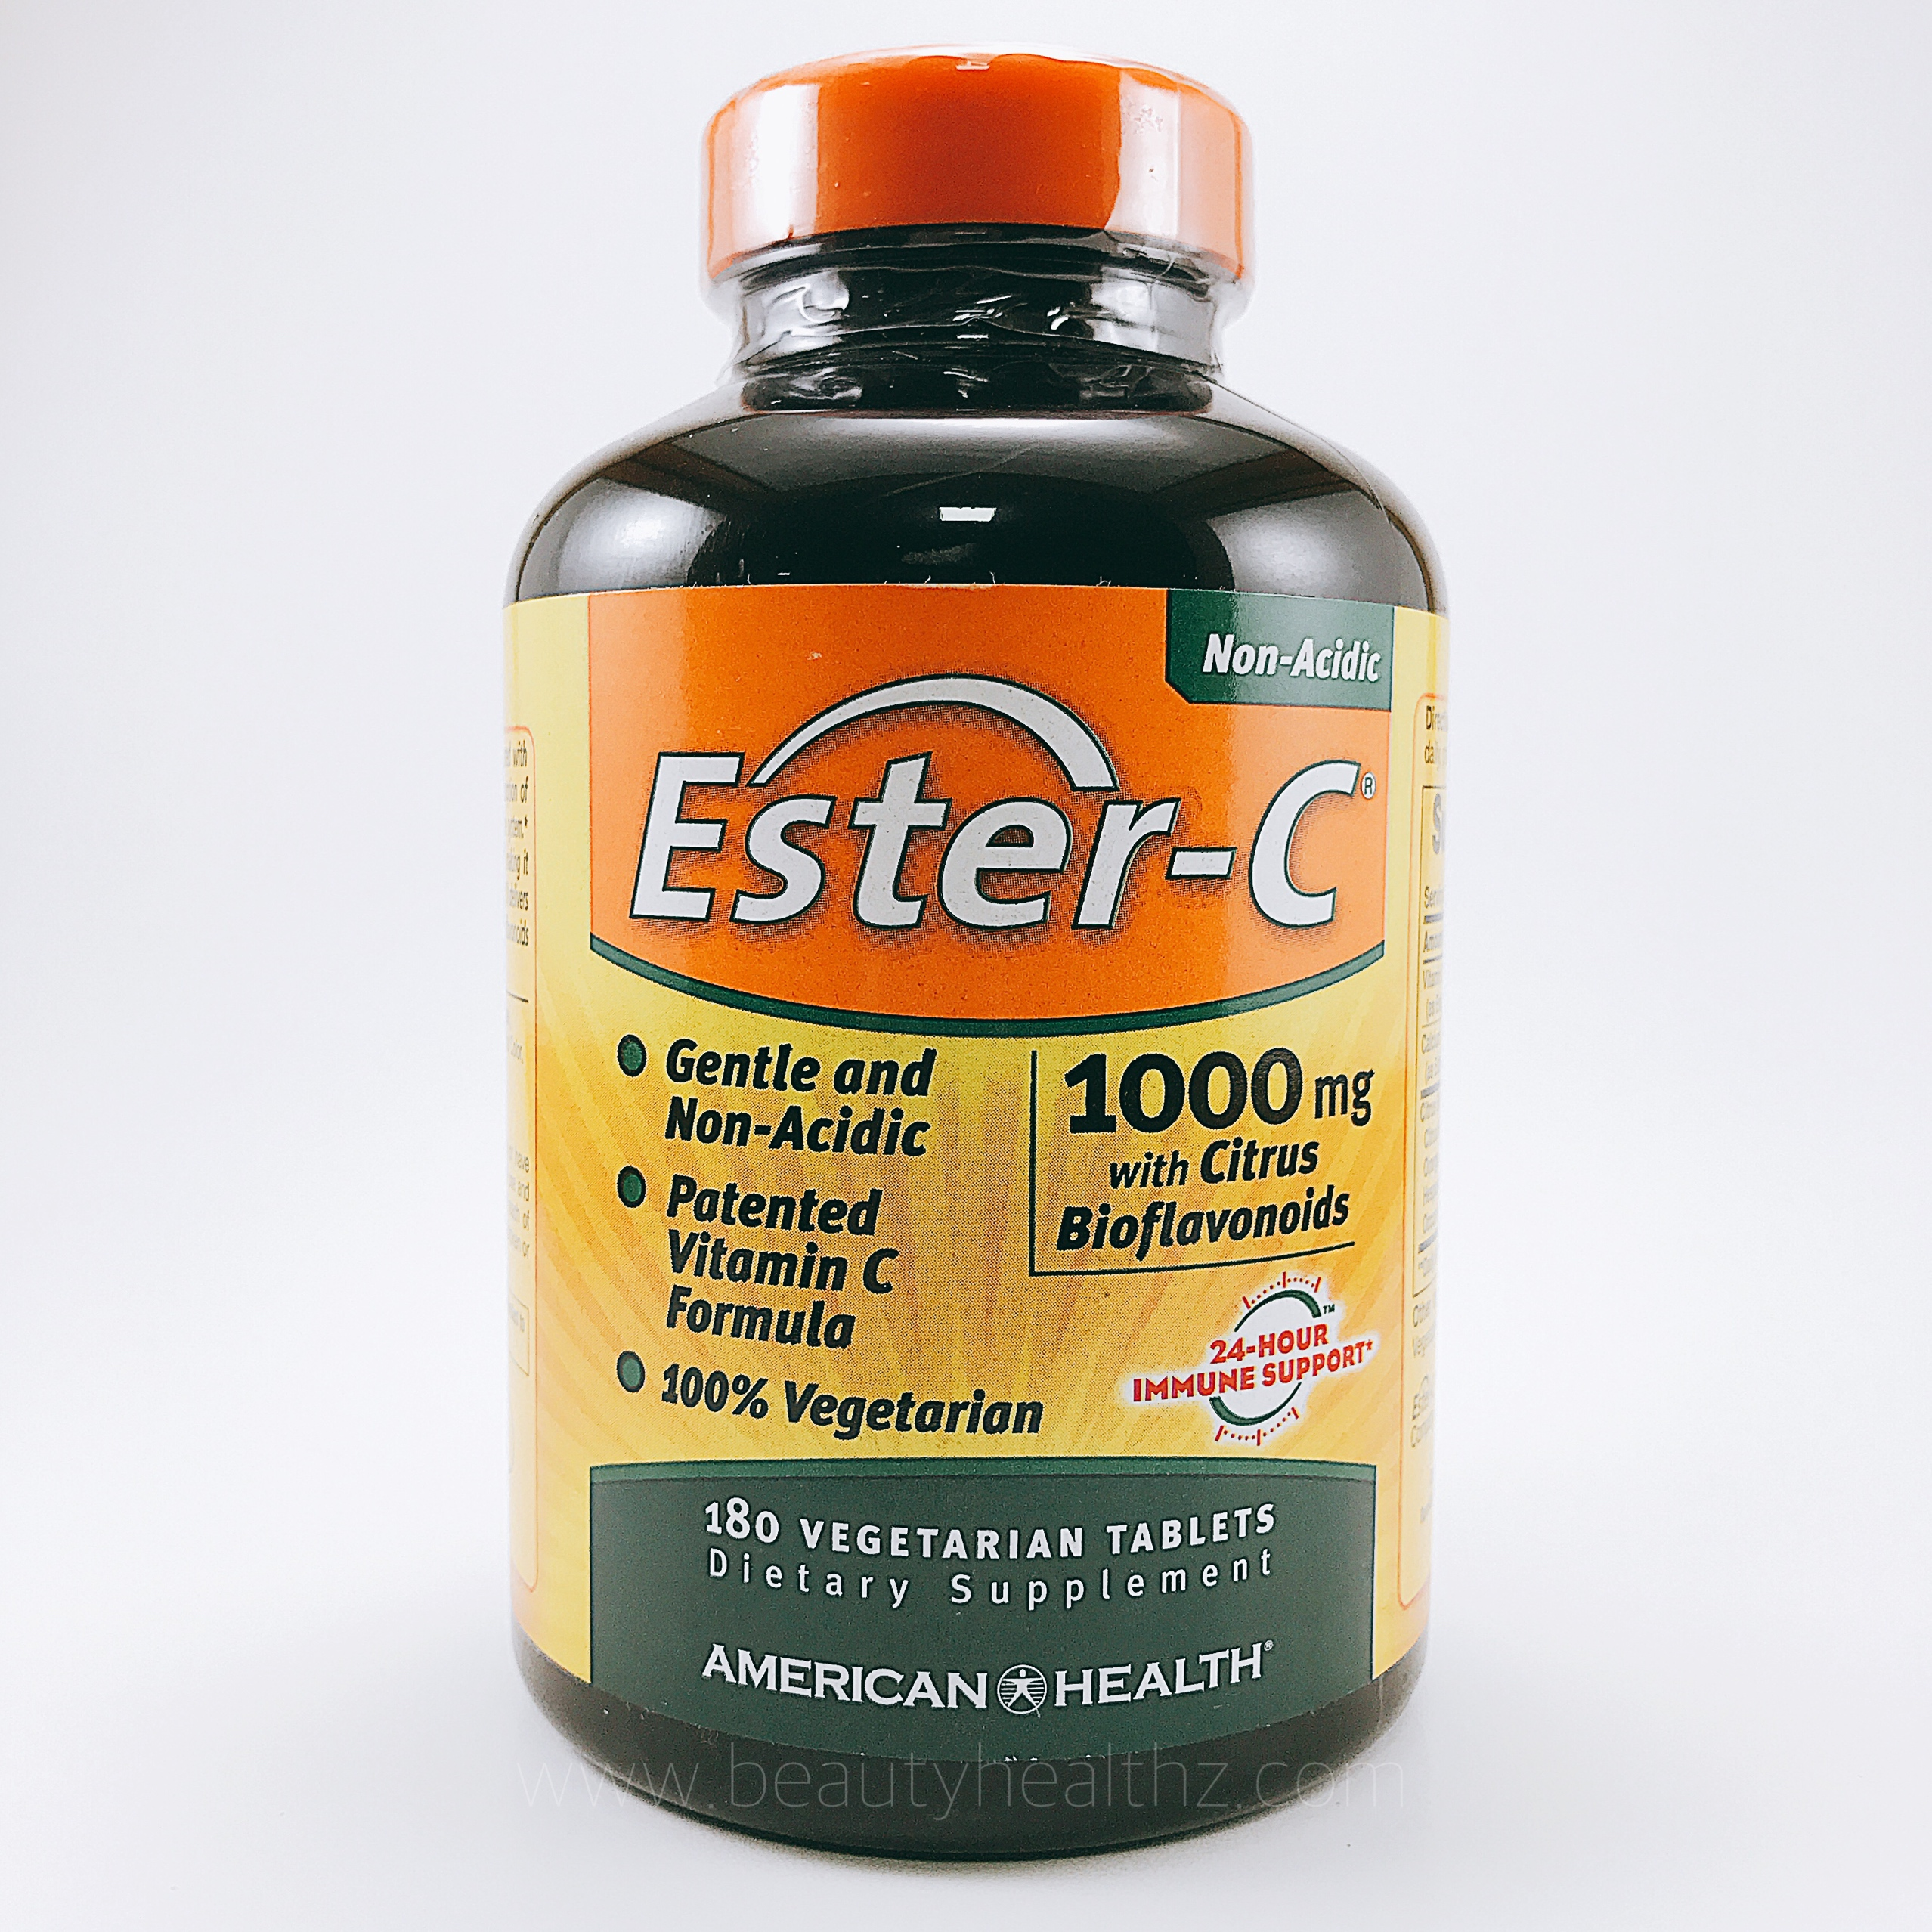 American Health, Ester-C, 1000 mg with Citrus Bioflavonoids, 180 Veggie Tabs